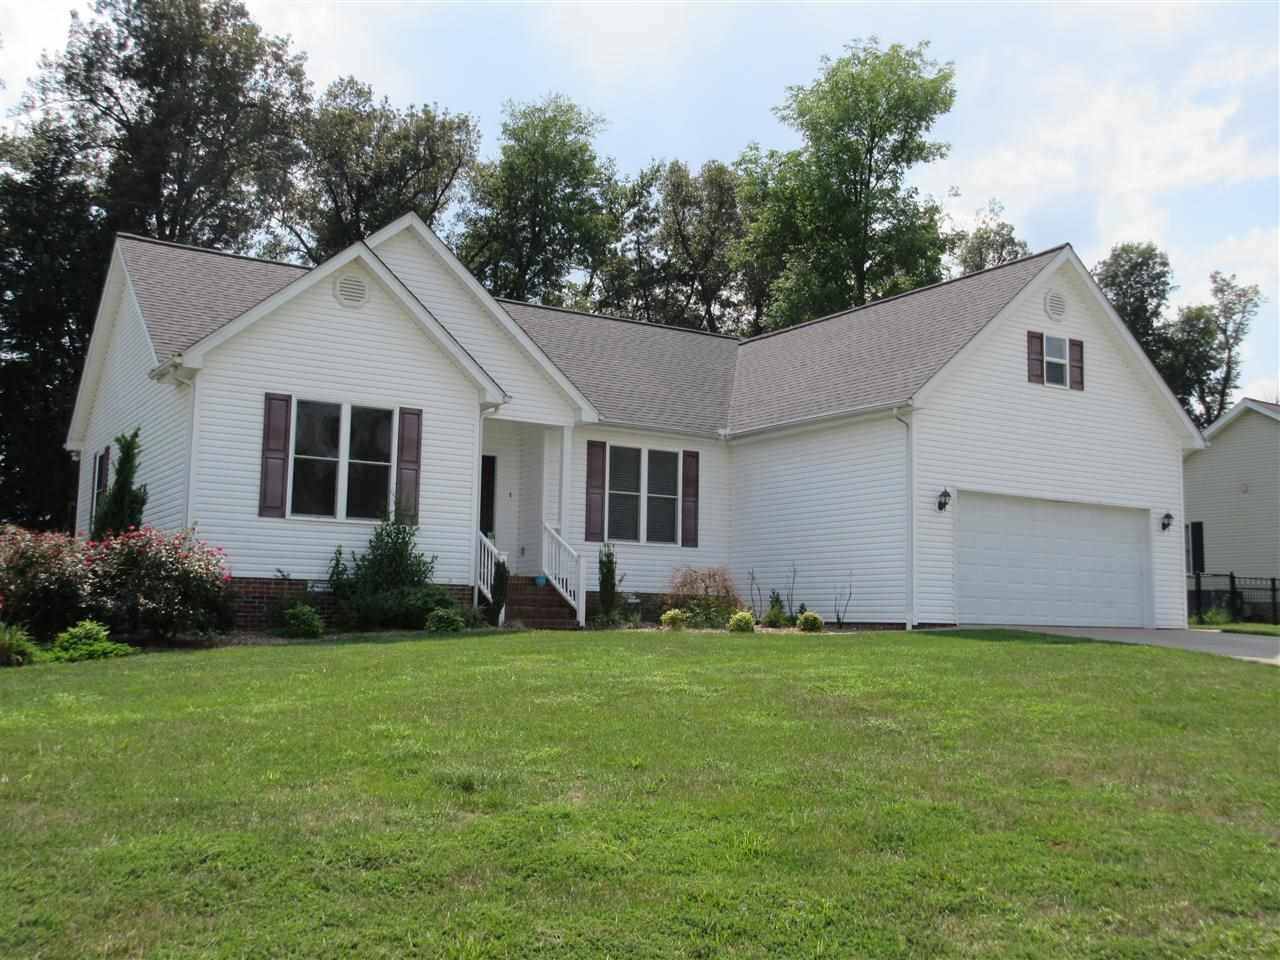 Real Estate for Sale, ListingId: 29713652, West Paducah,KY42086